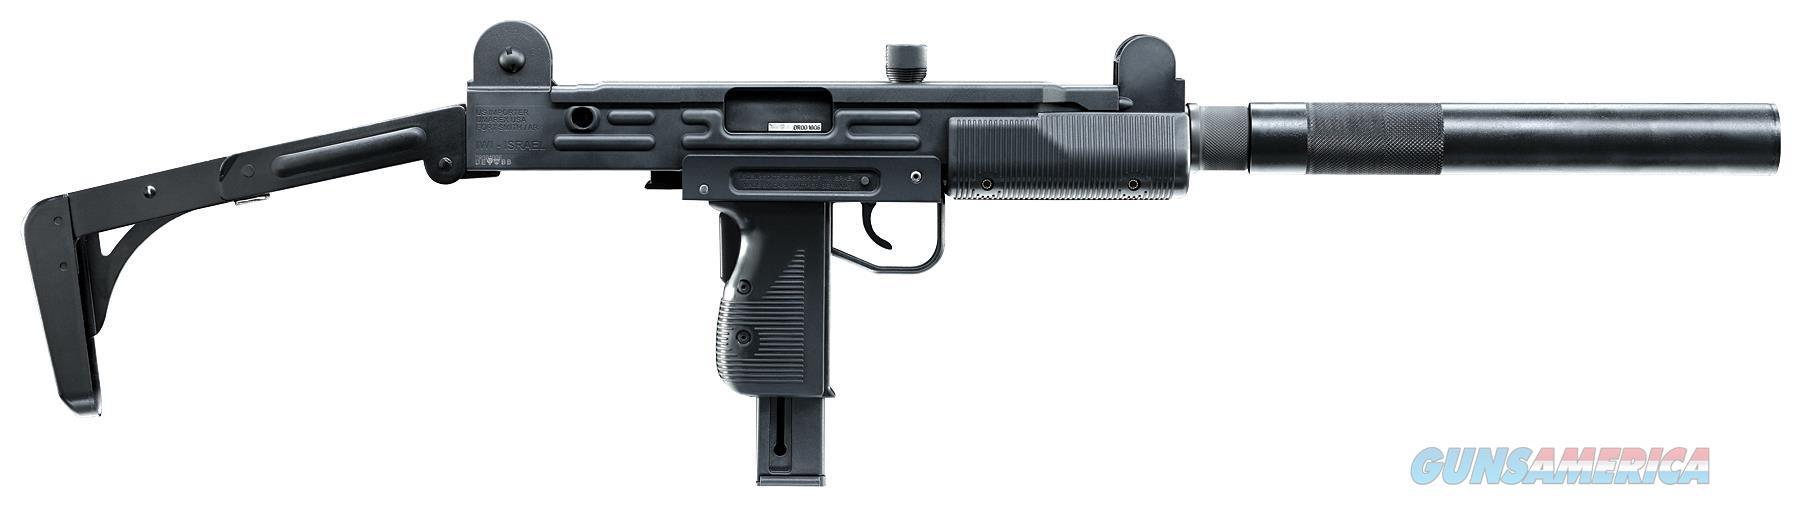 "Walther Arms 5790300 Uzitactical Rifle Semi-Auto 22 Lr 16"" 20+1 Folding Stk 5790300  Guns > Rifles > W Misc Rifles"